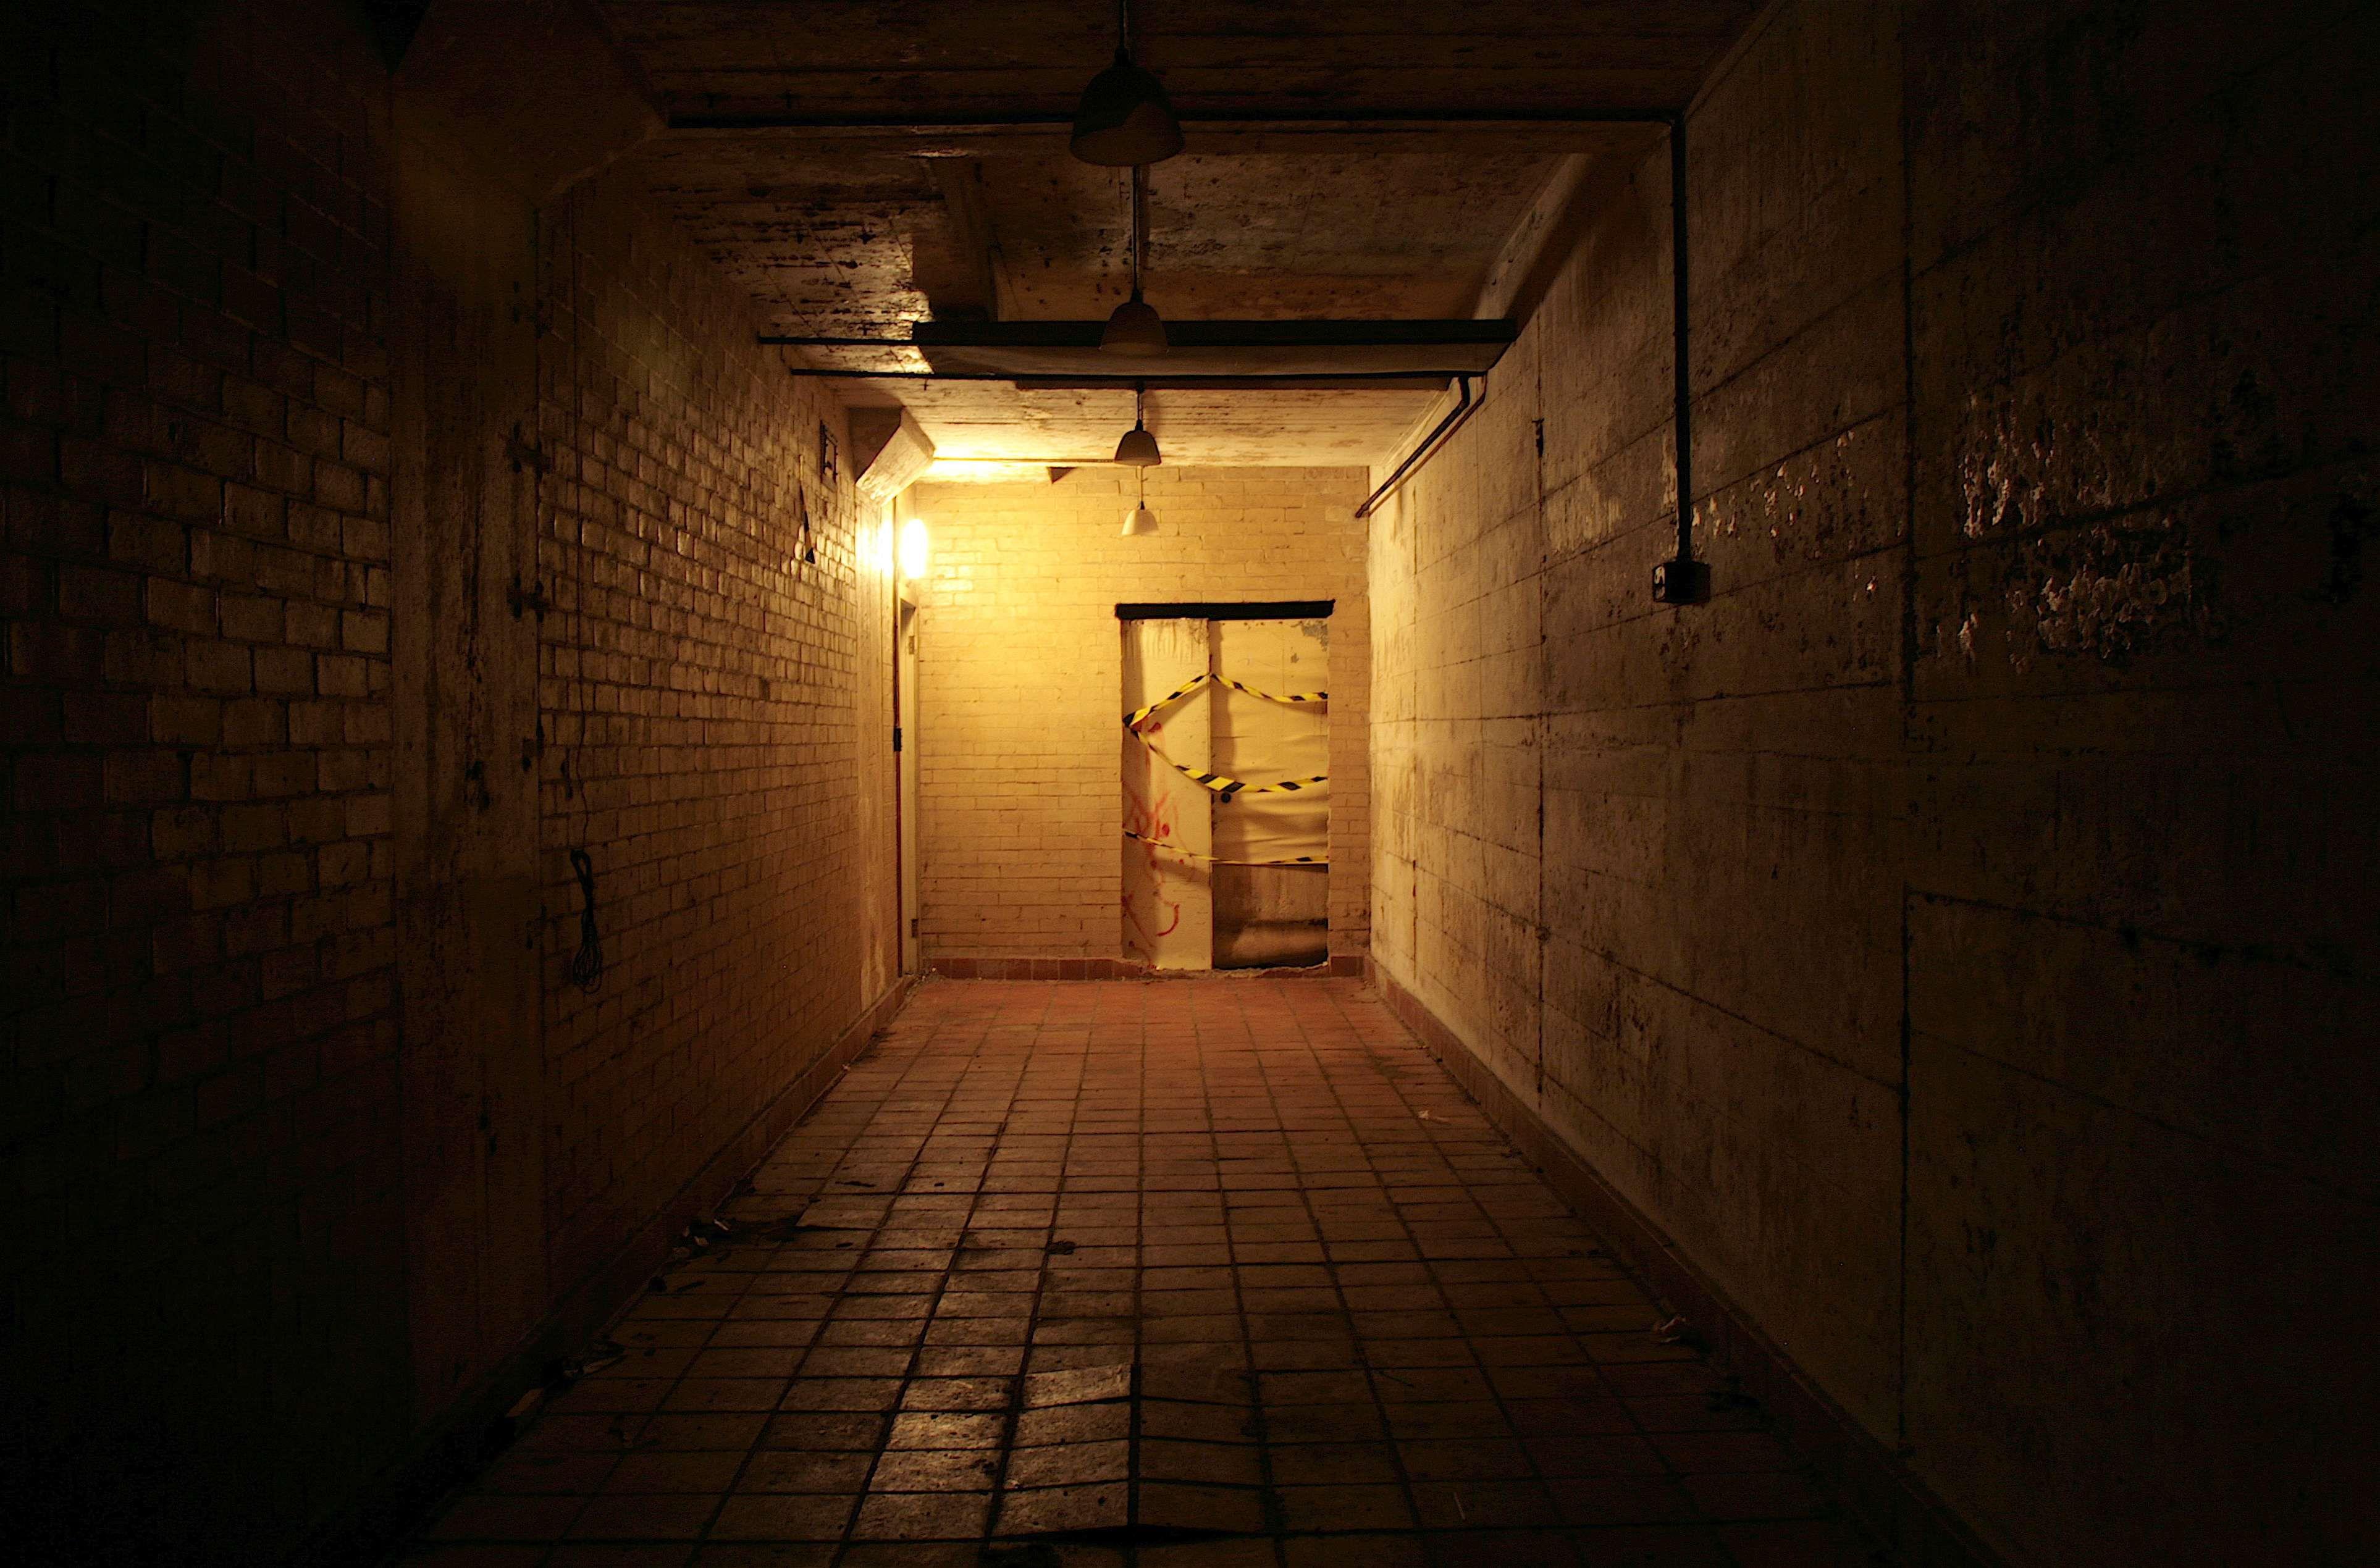 Dark hallway wallpaper  Pin by Uni Ross on d Modeling Ideas  Underground  Pinterest